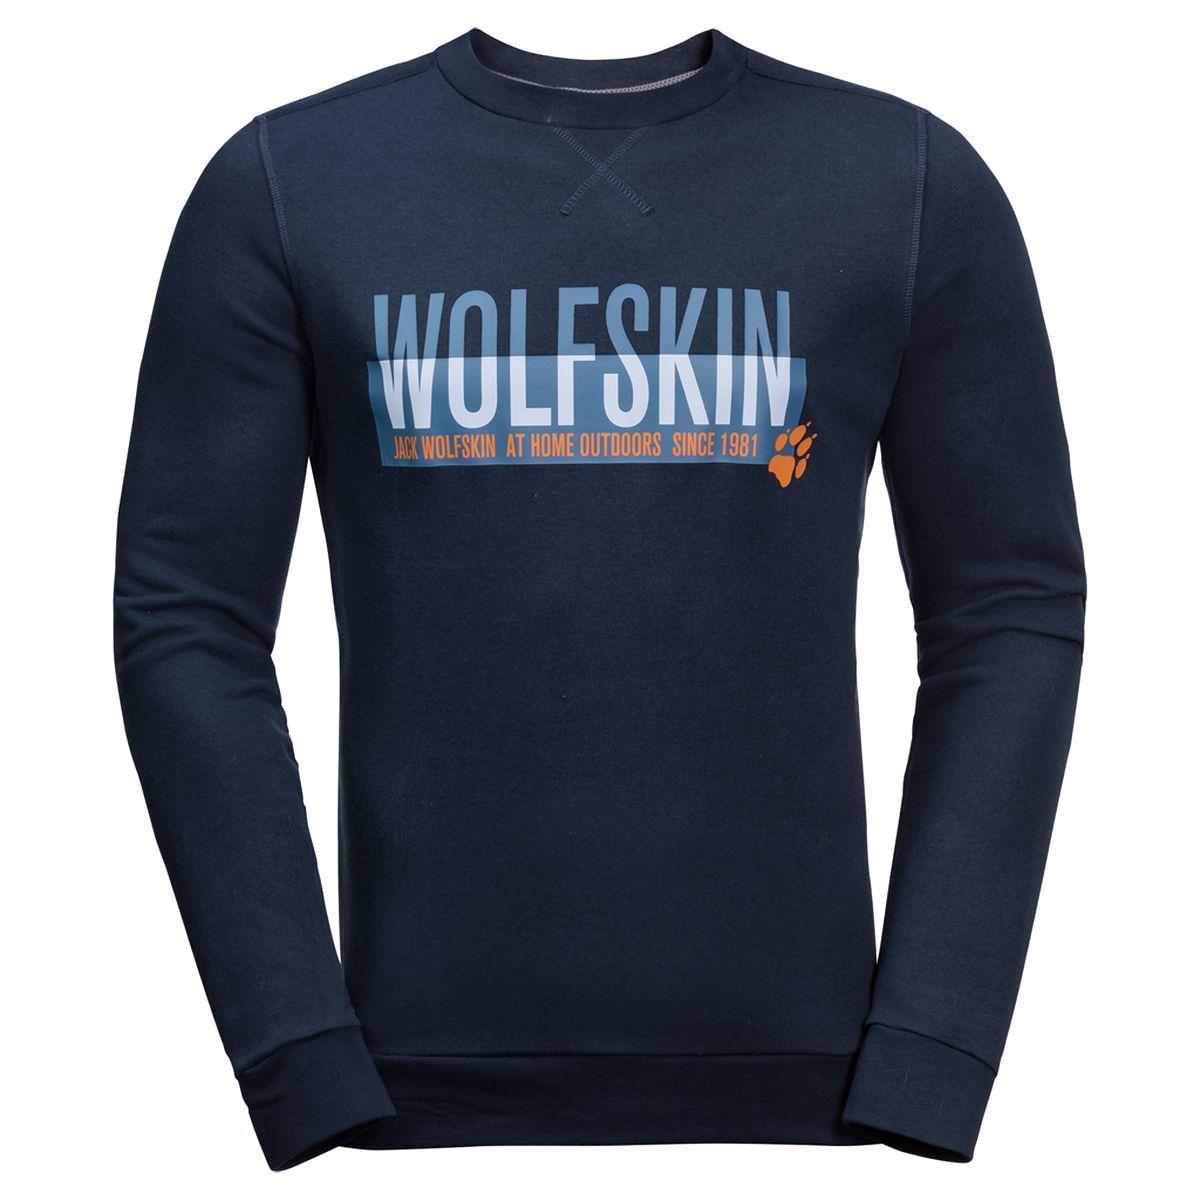 Свитшот Jack Wolfskin v neckline slogan print tshirt